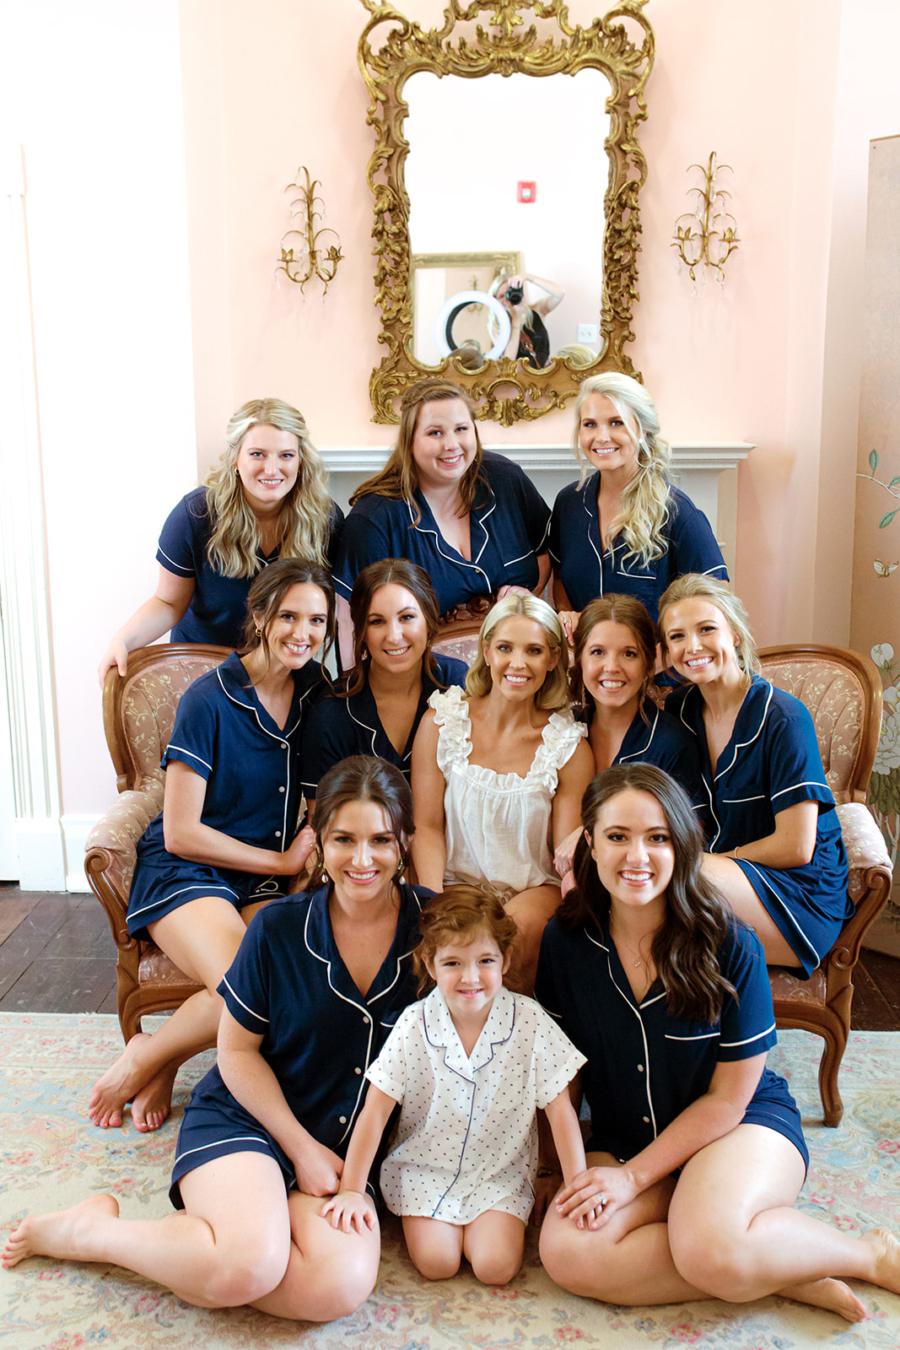 Blue bridal party getting ready pajamas